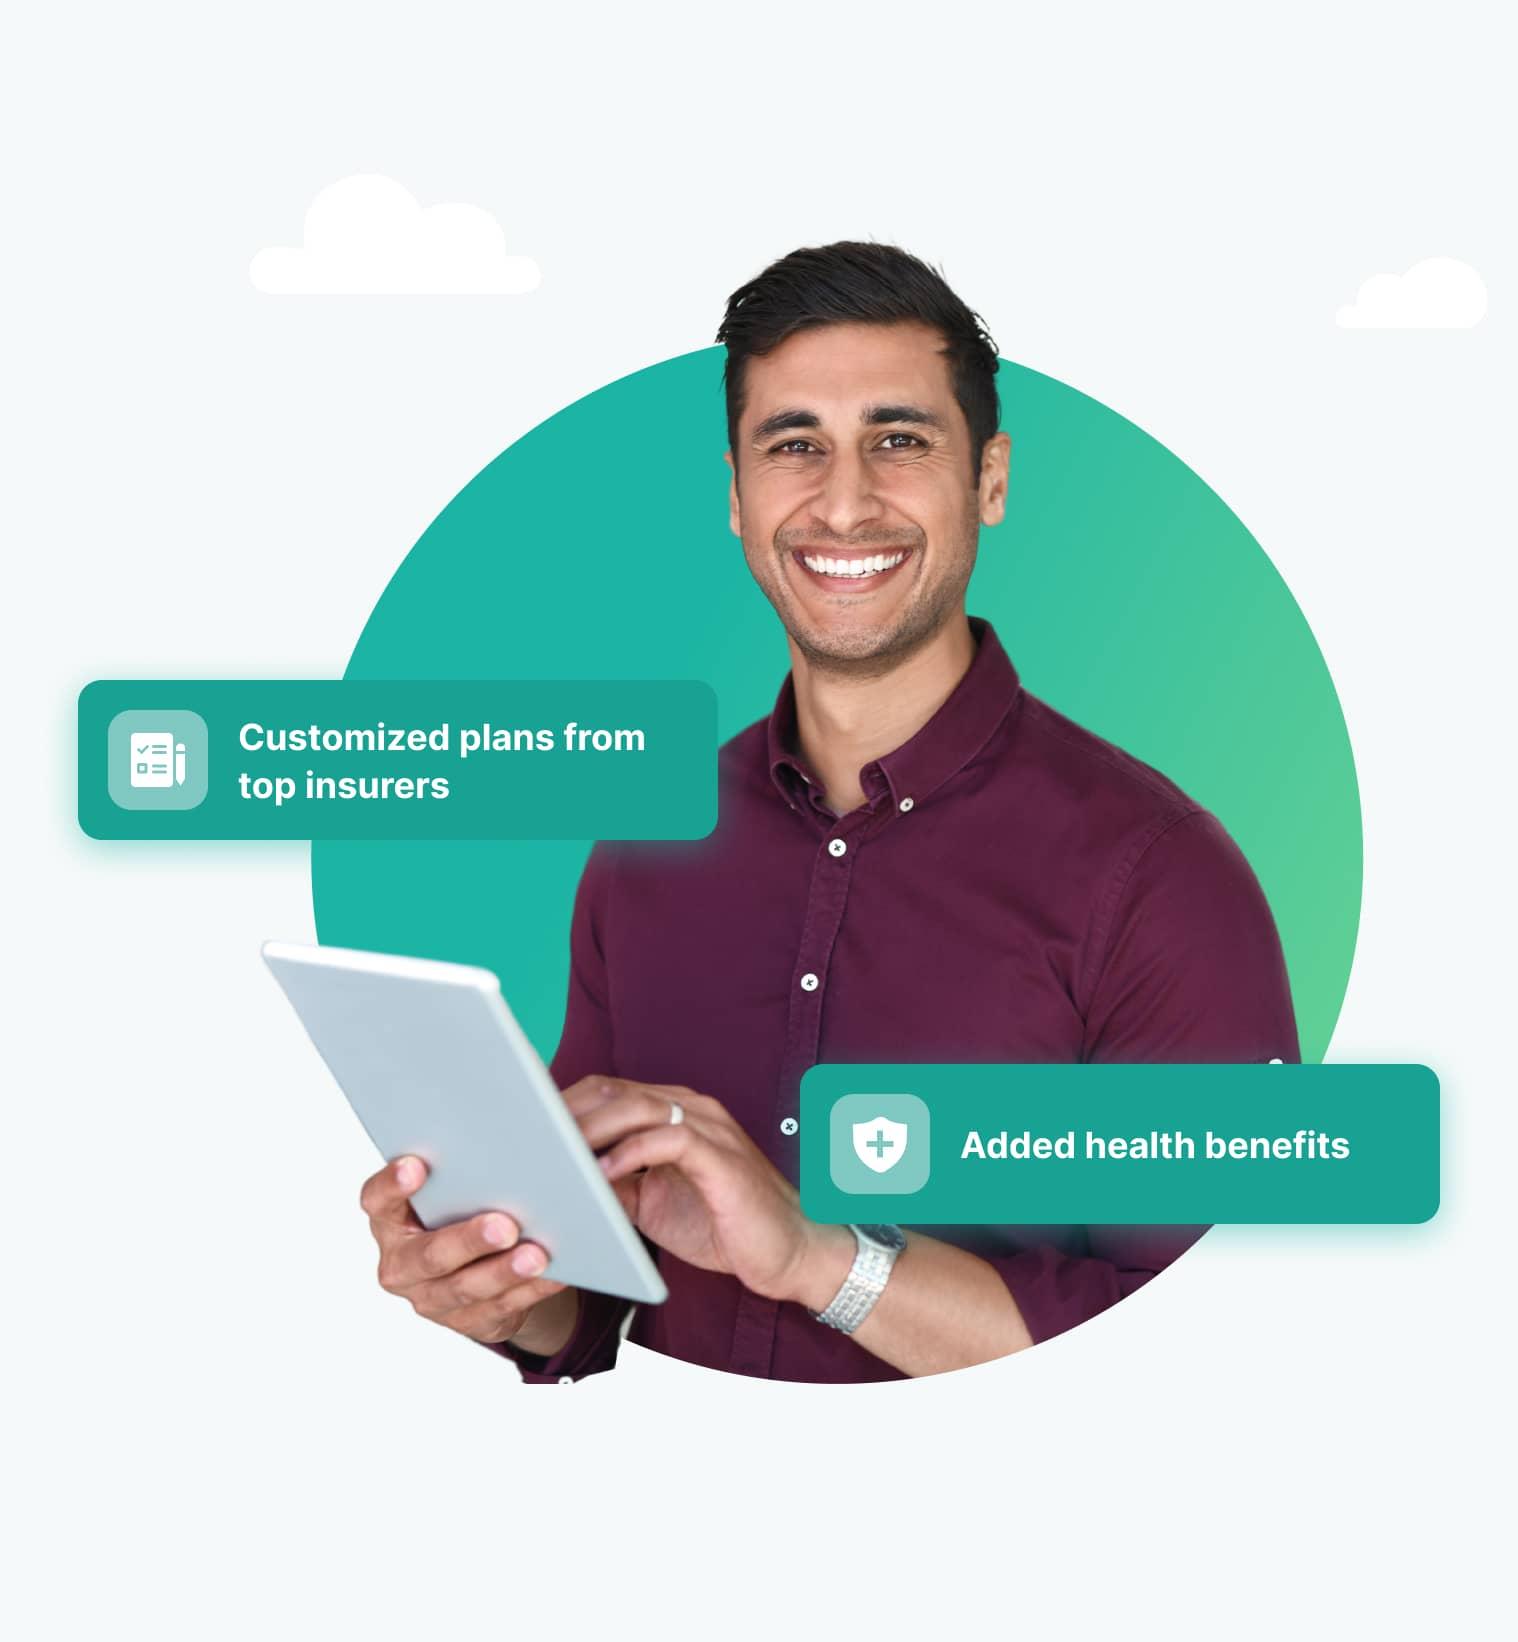 group health insurance for startups